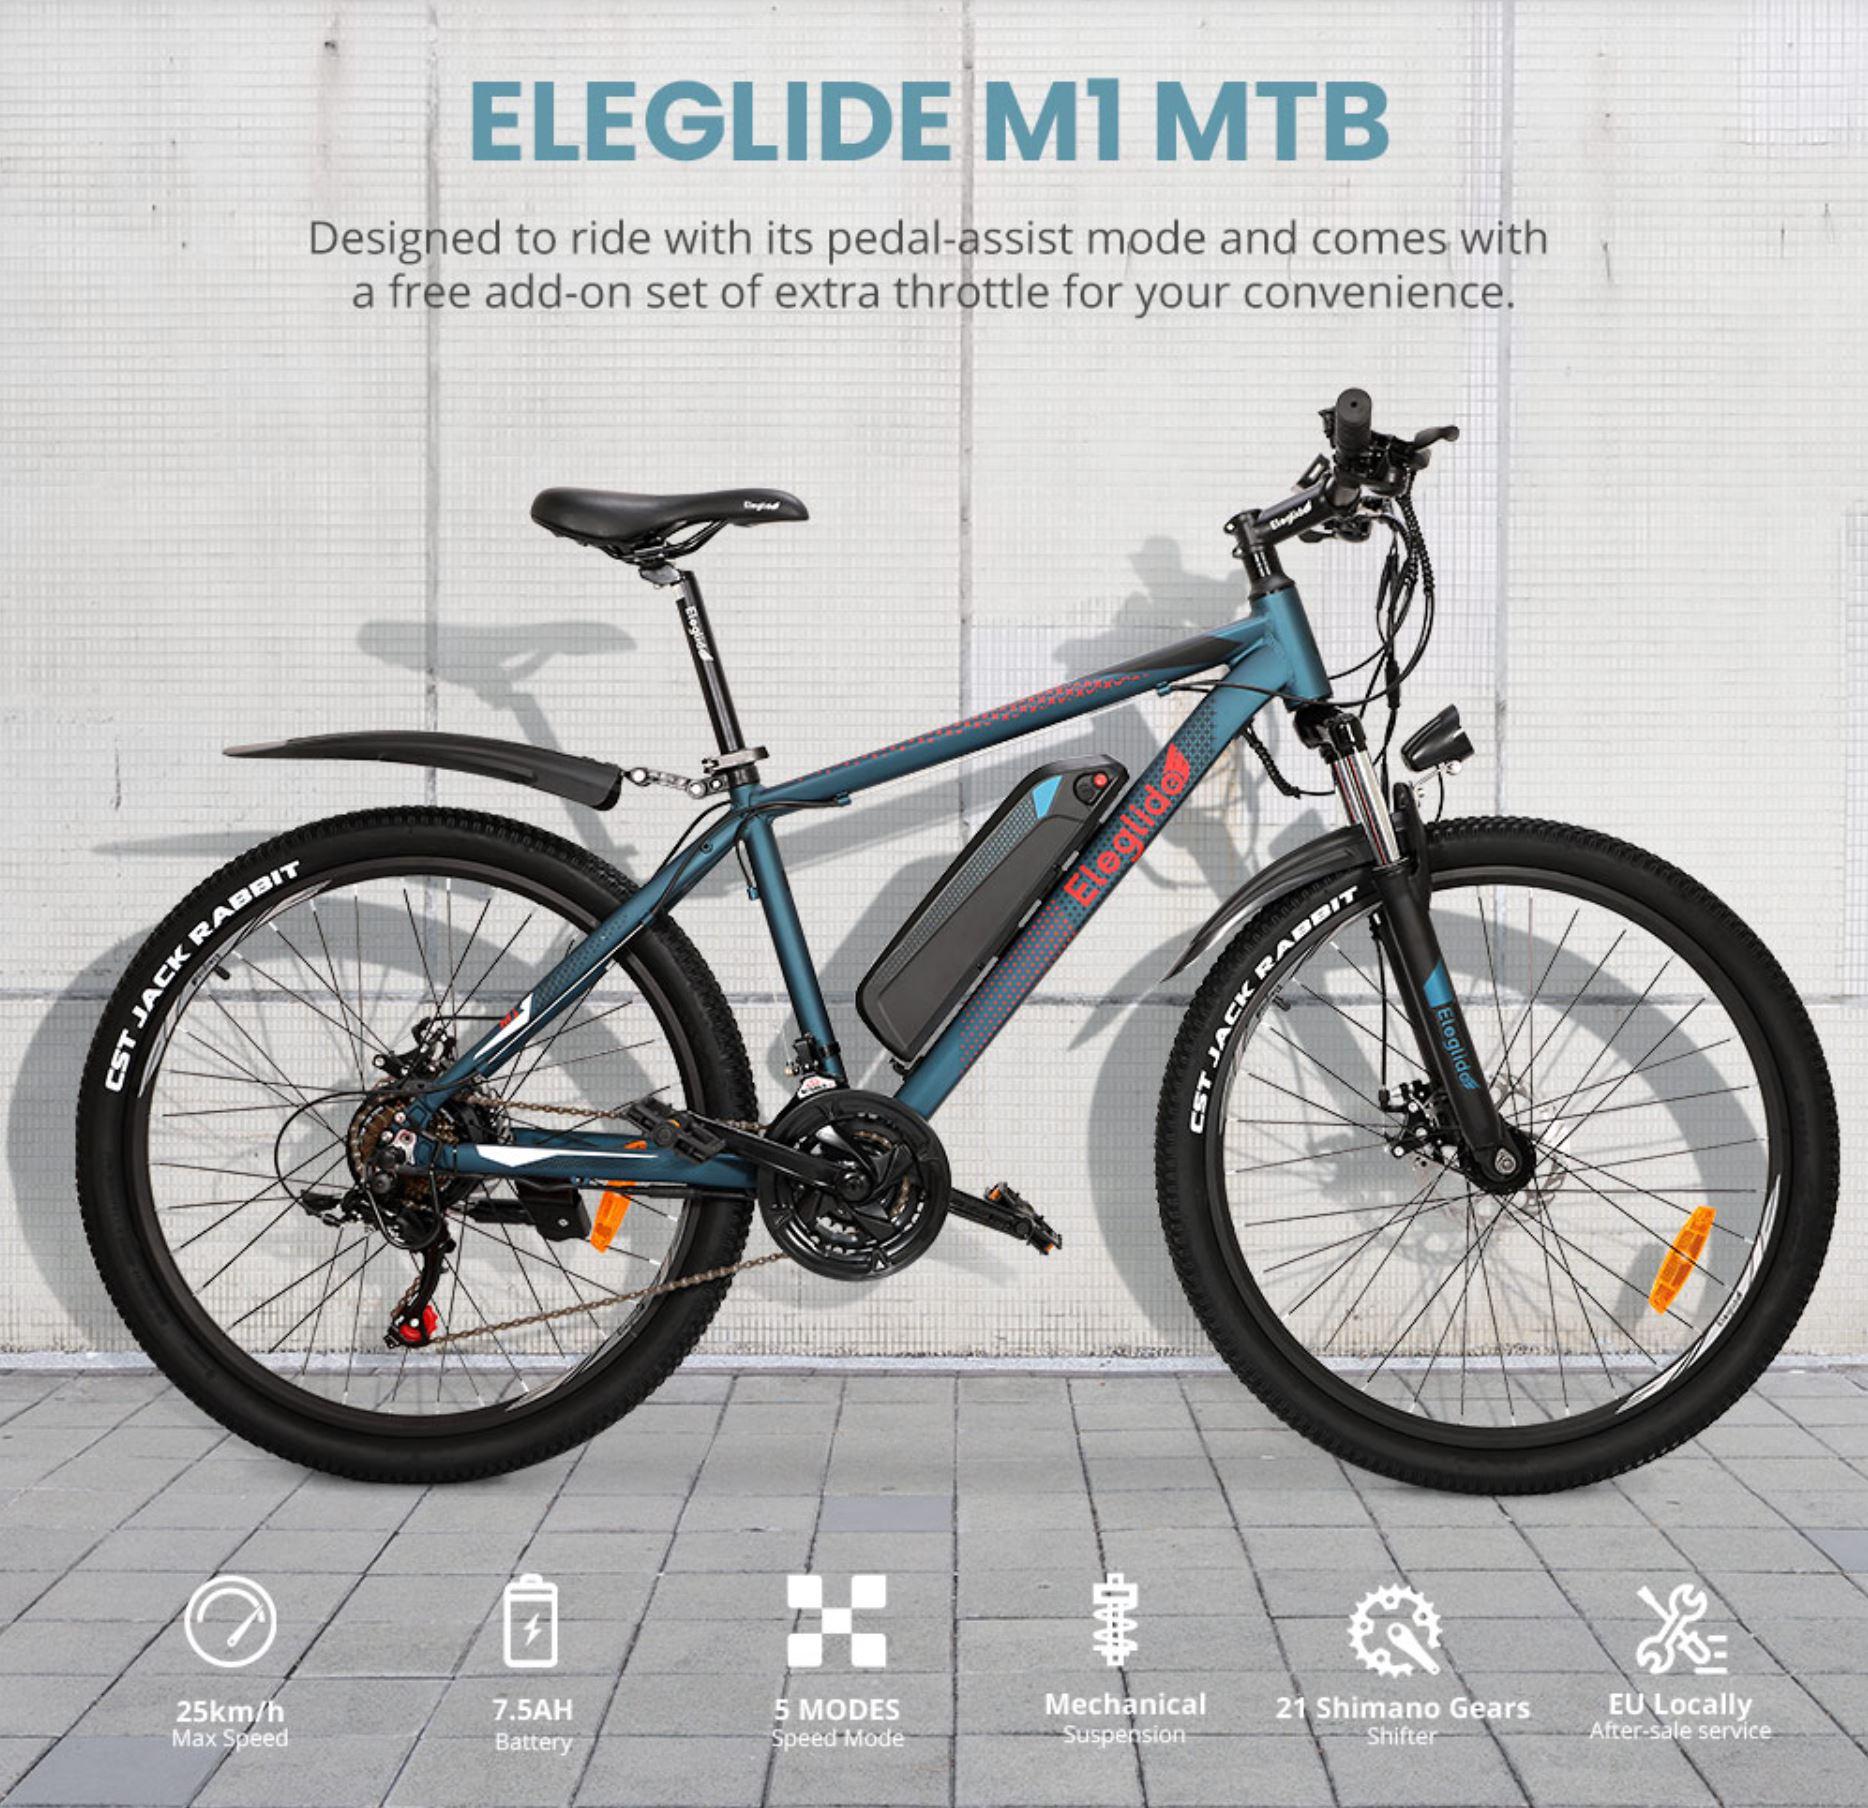 rower elektryczny górski - Eleglide M1 MTB